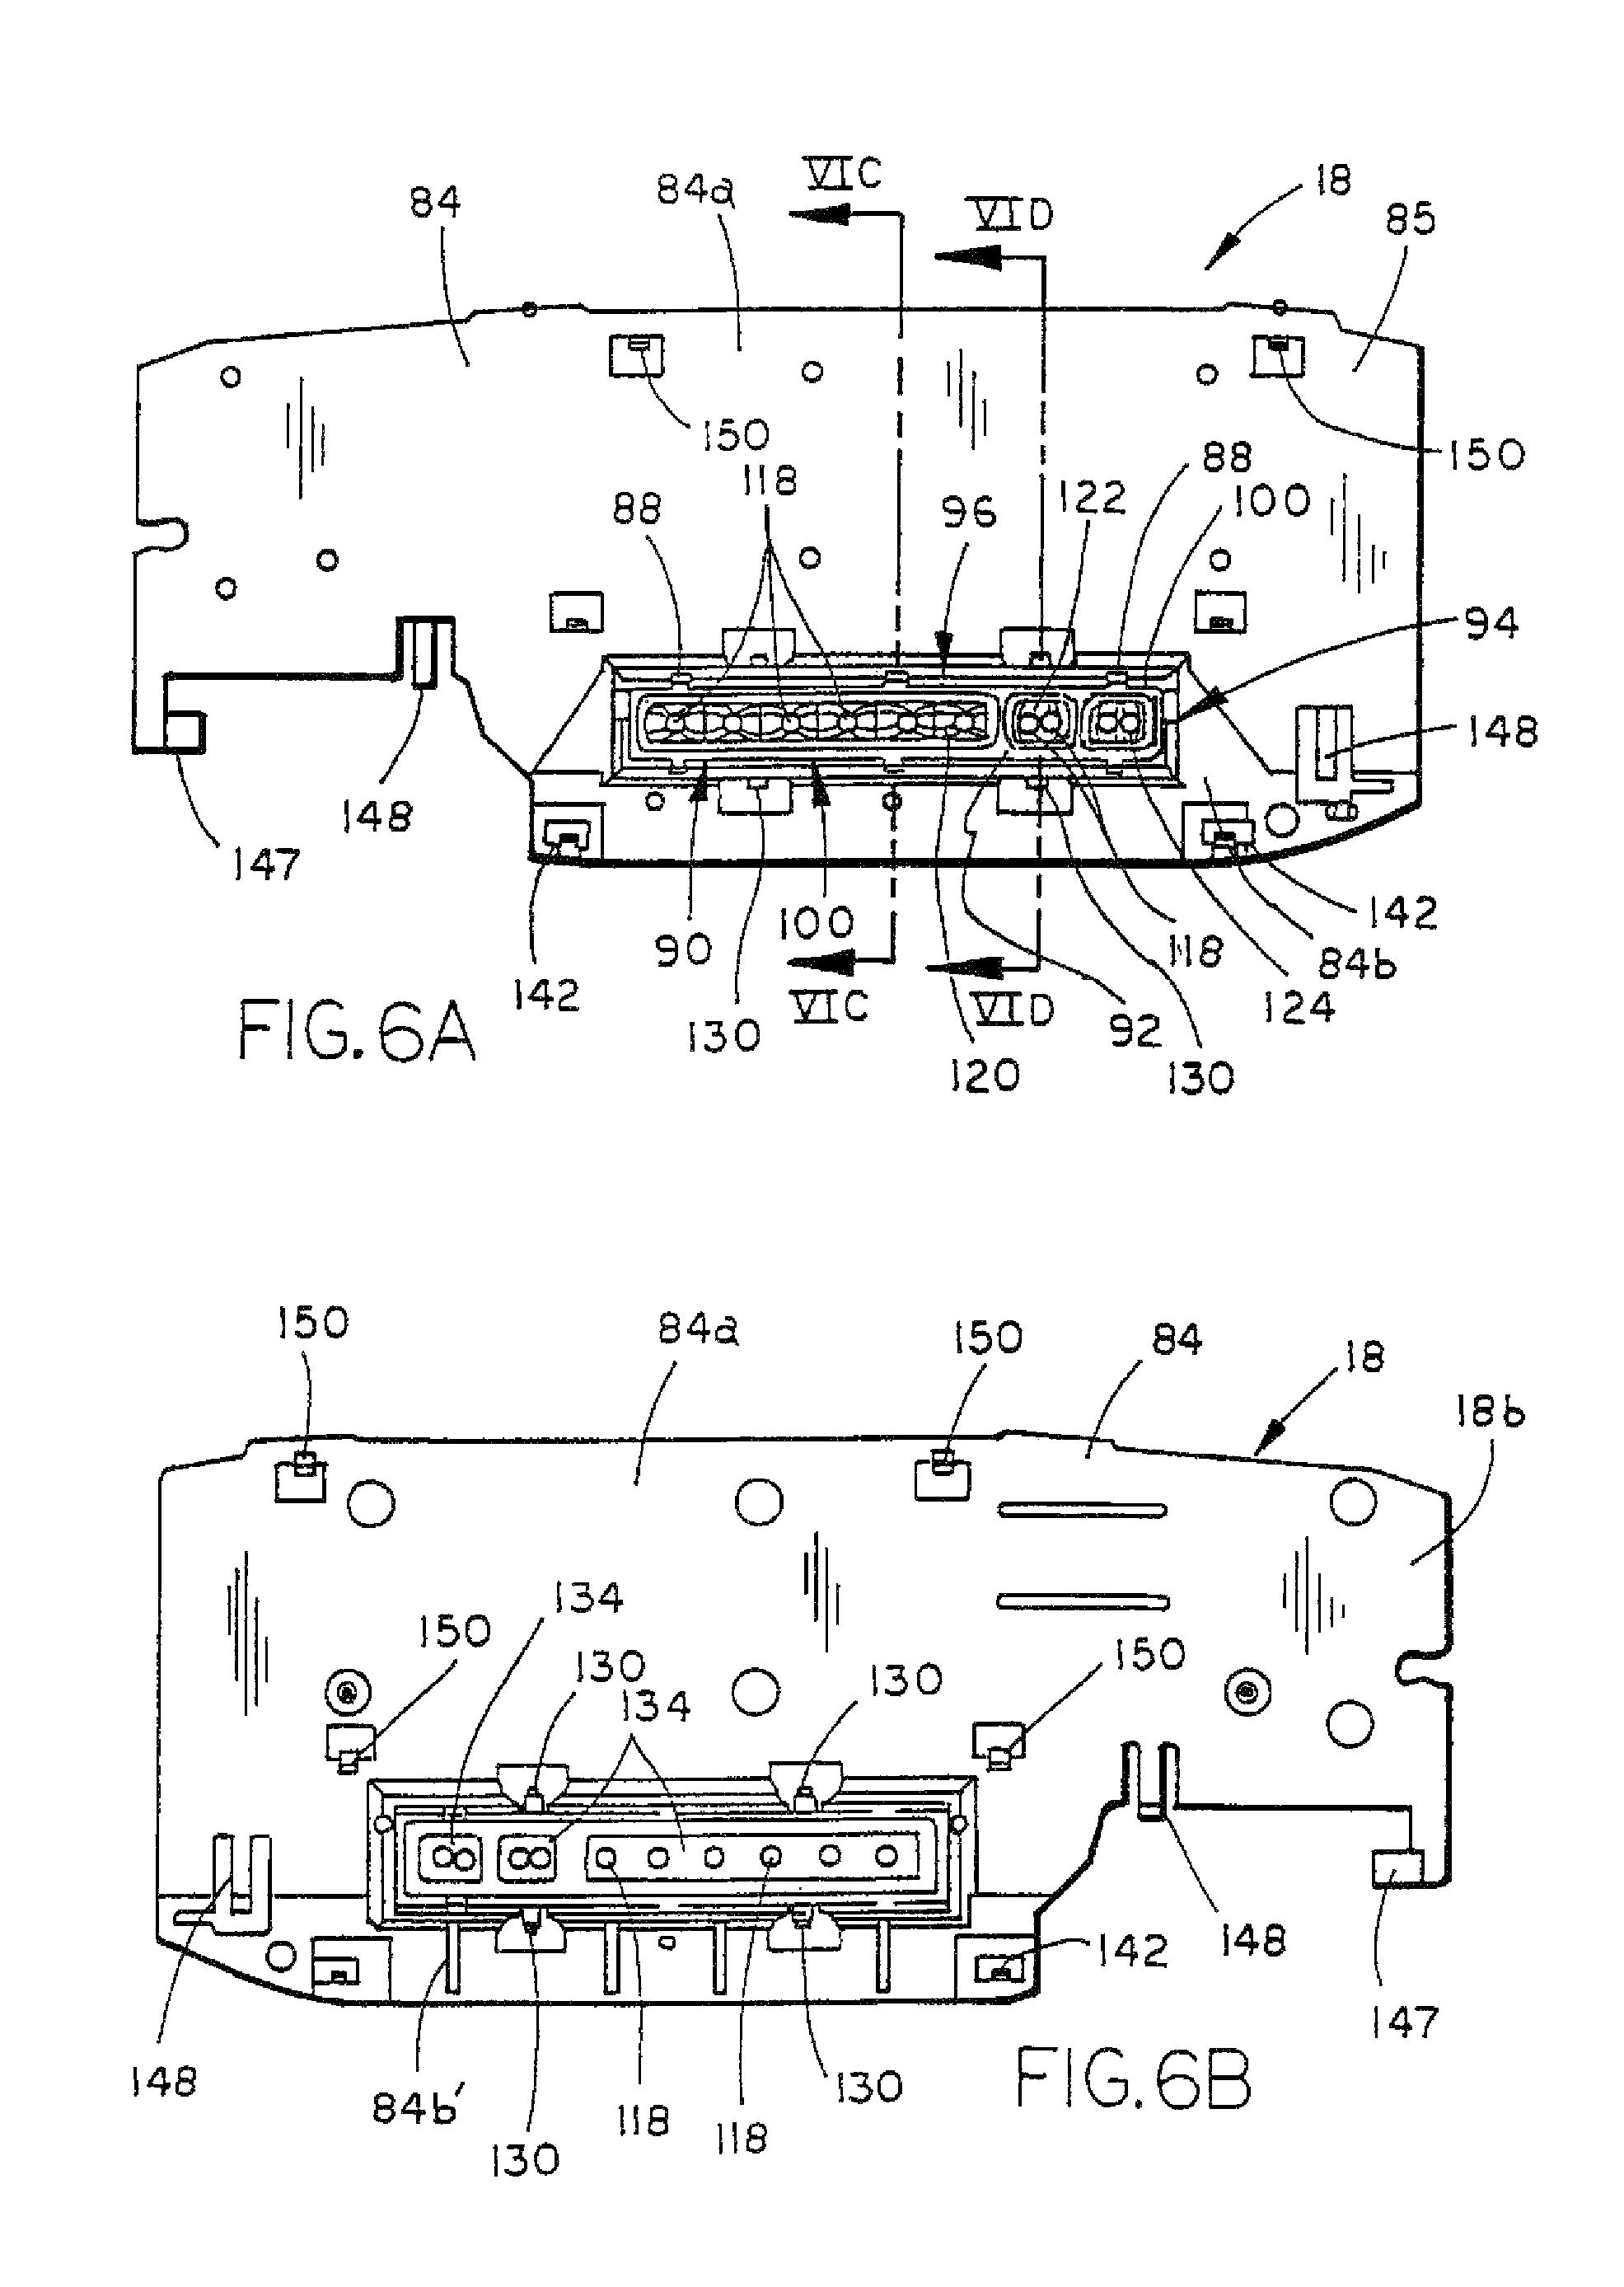 Riviera Wiring Diagram Besides Peugeot 206 Schematic Wiring Diagrams